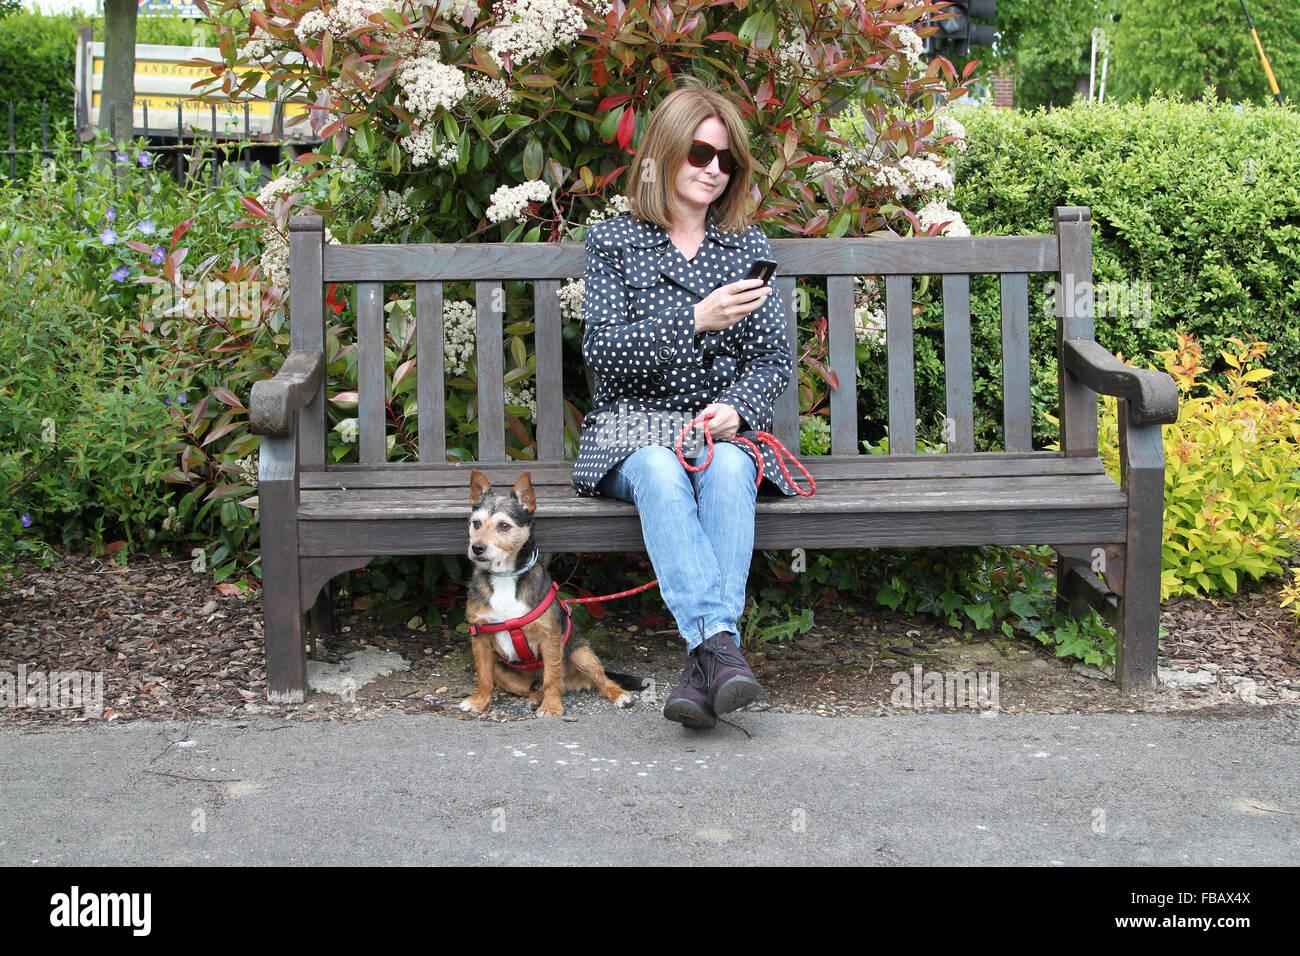 Pleasant Woman Sitting On Park Bench Looking At Mobile Phone With Frankydiablos Diy Chair Ideas Frankydiabloscom